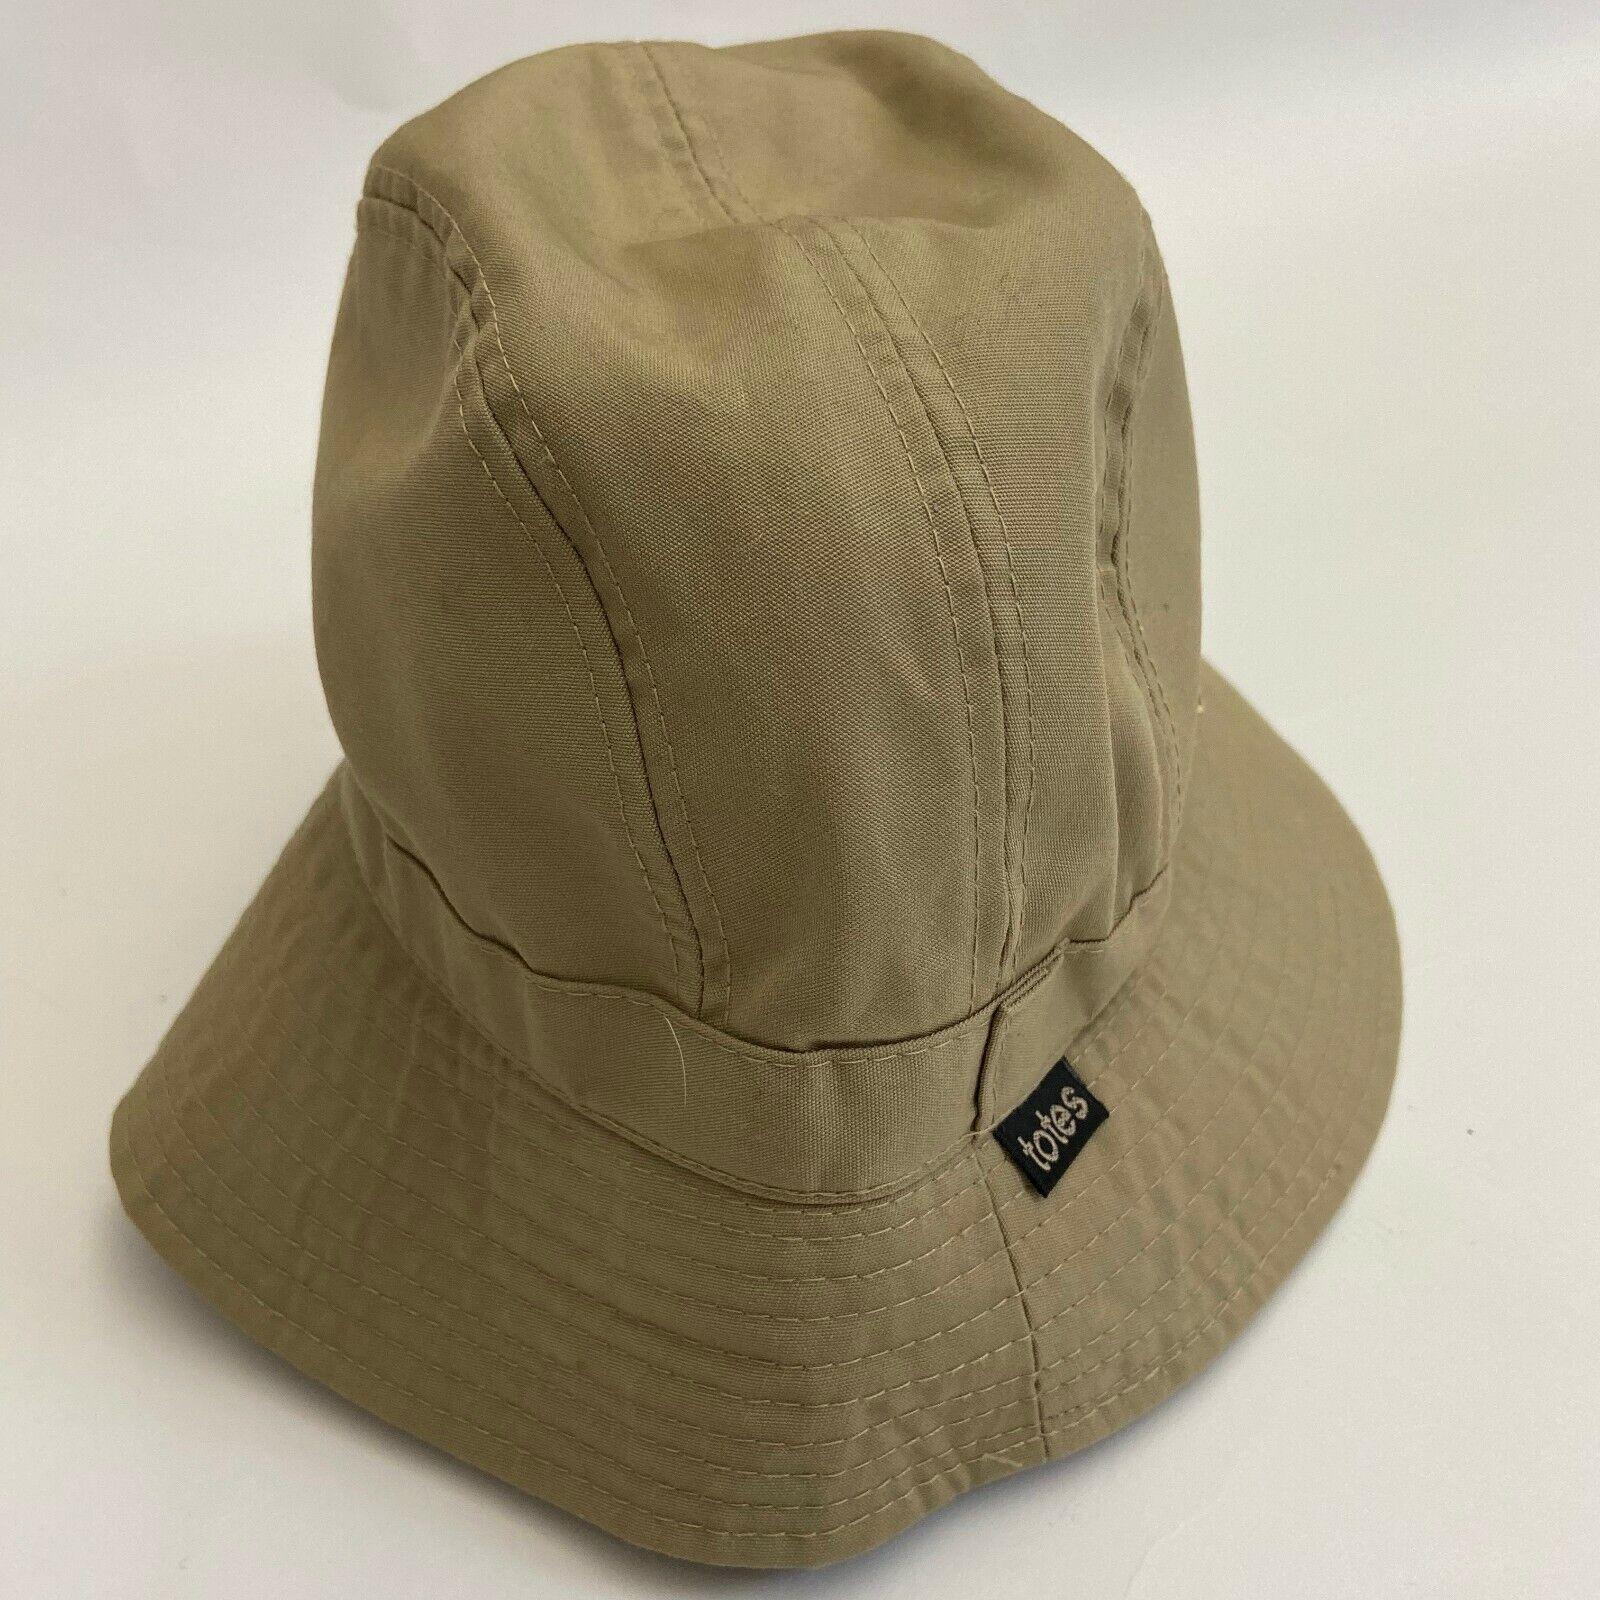 Vintage Totes Beige Womens Bucket Hat Cap outdoor hiking travel